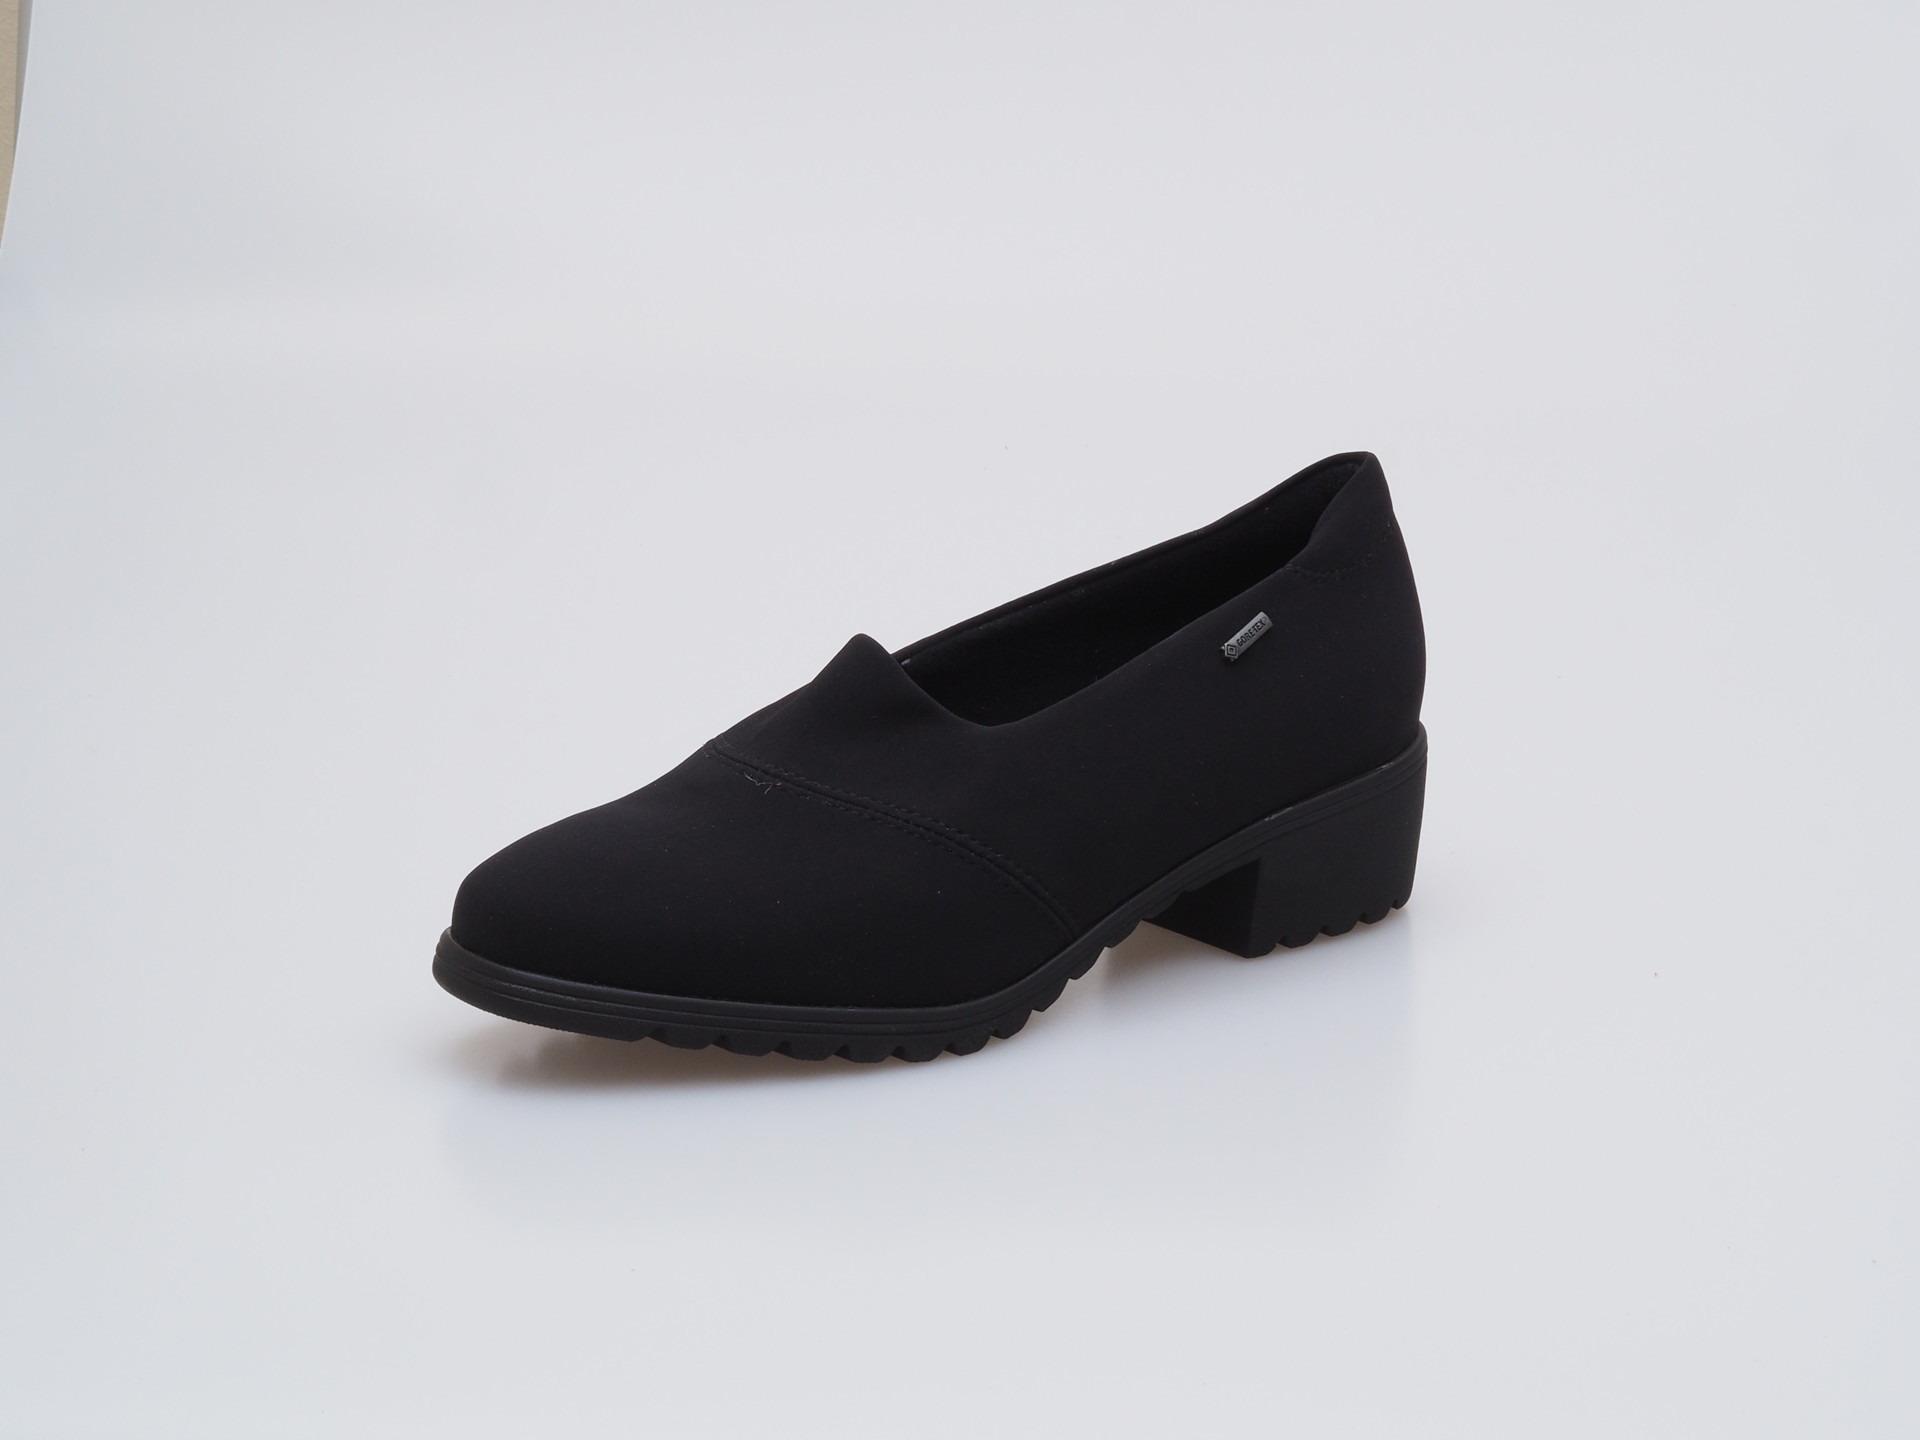 Soňa - Dámska obuv - Poltopánky - Gore- texová dámska členková obuv ... 54b421863f8